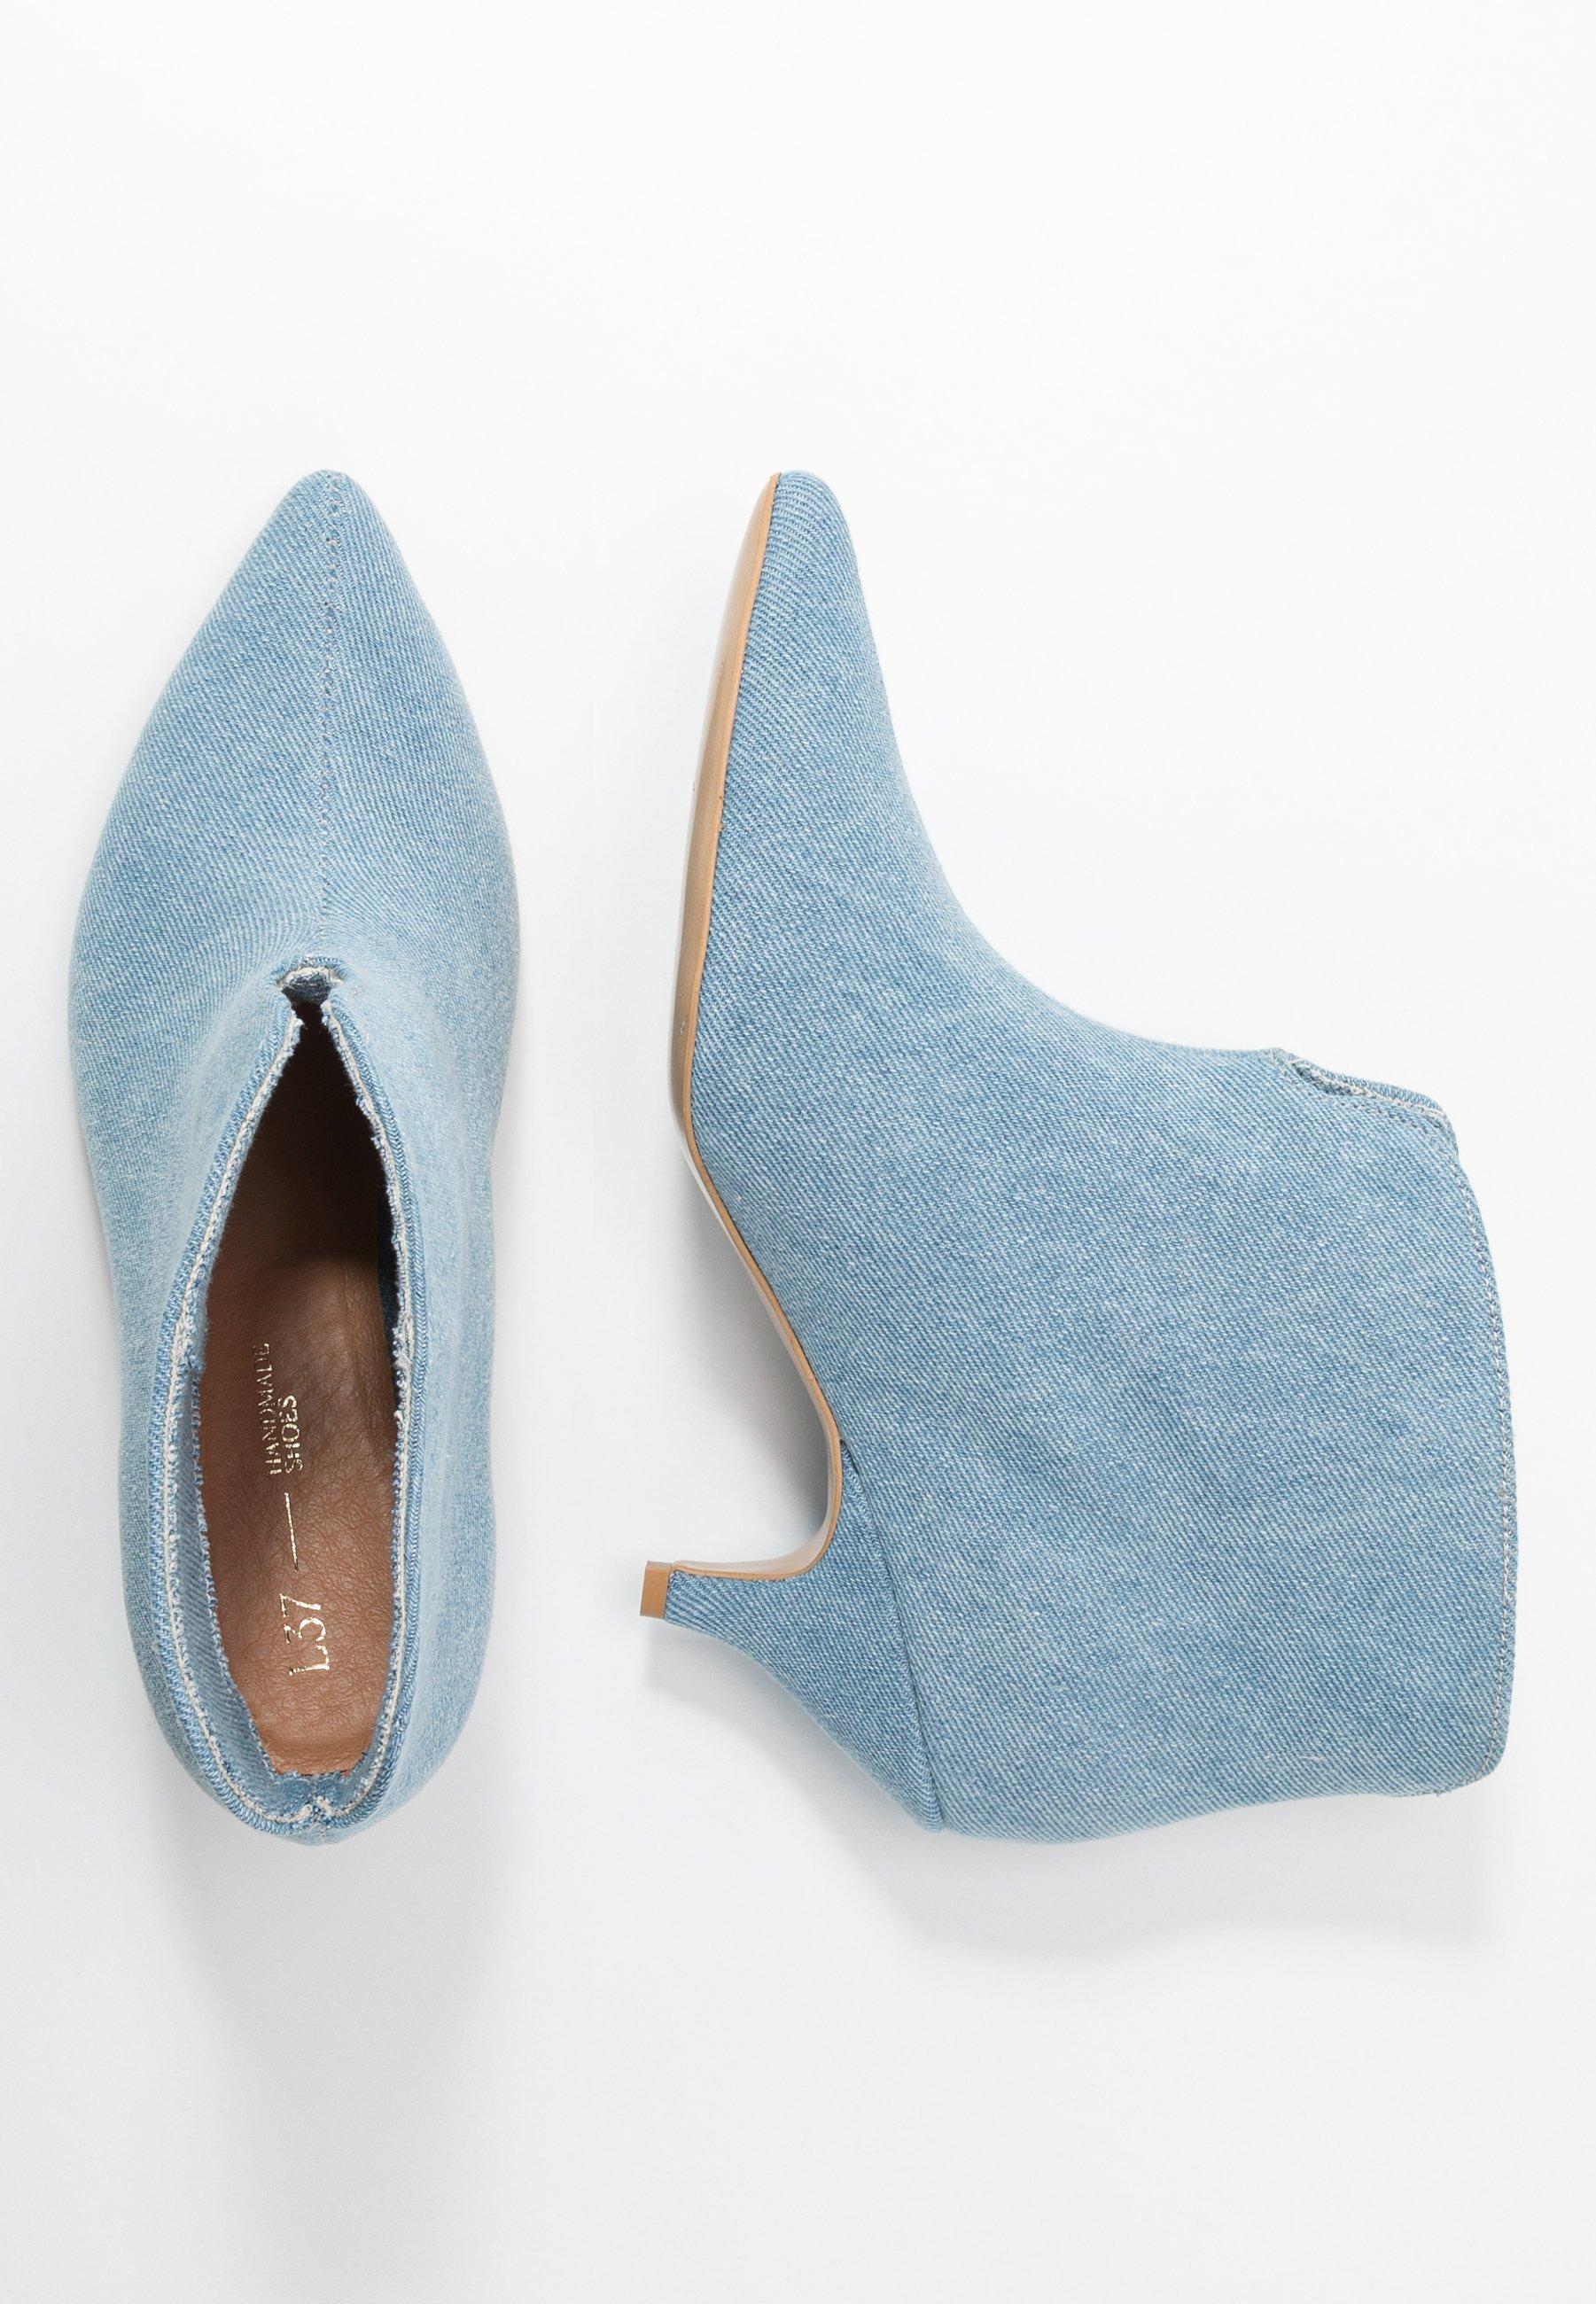 L37 Make Your Move - Ankelboots Blue Denim